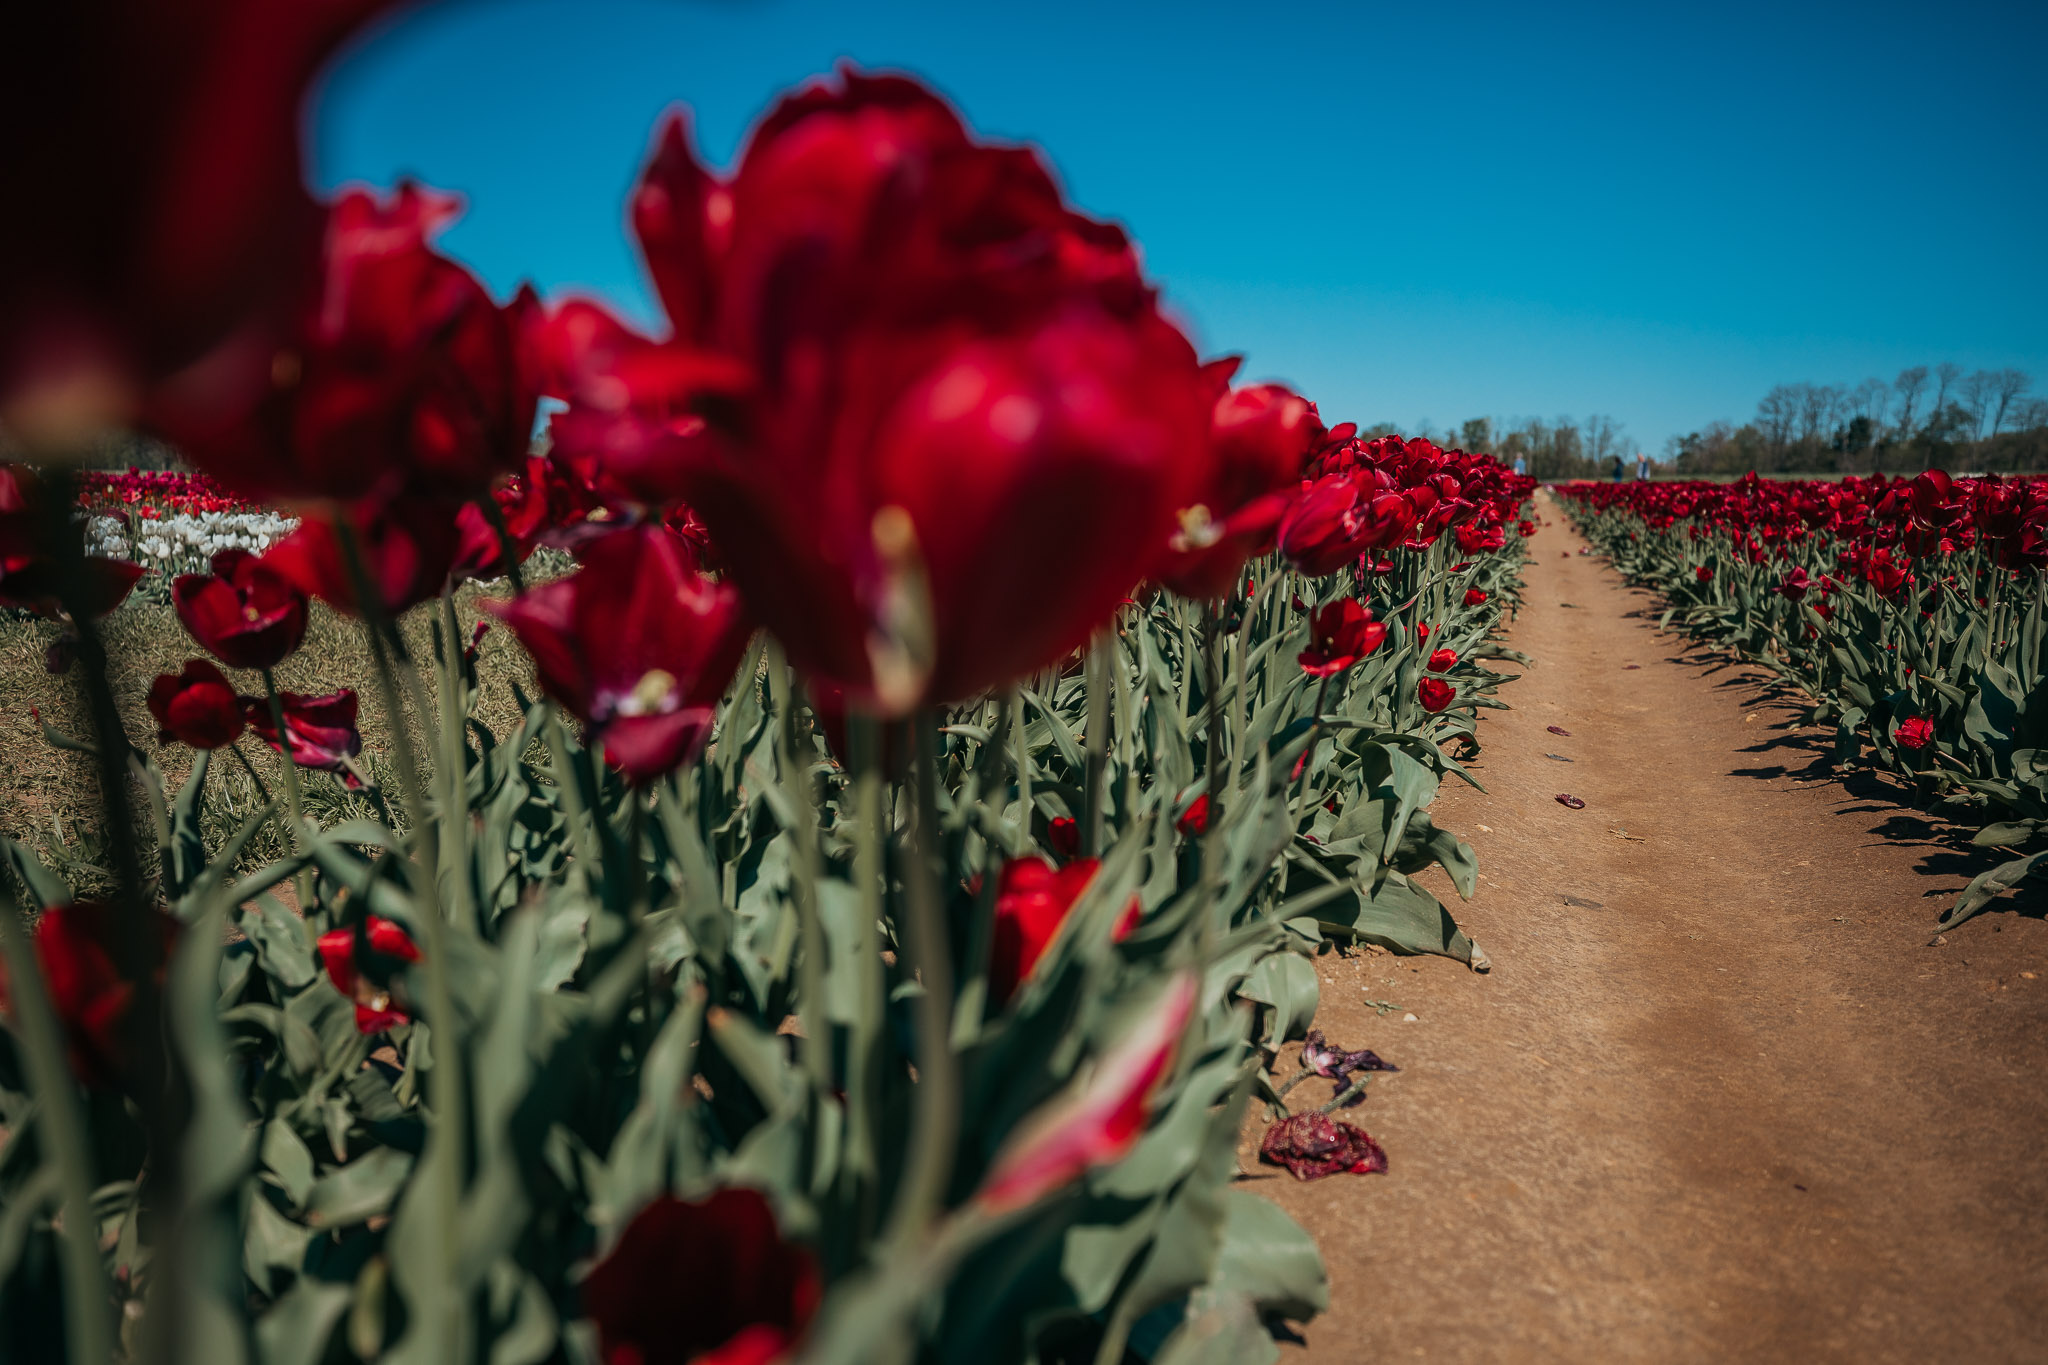 Tulips-4850.jpg